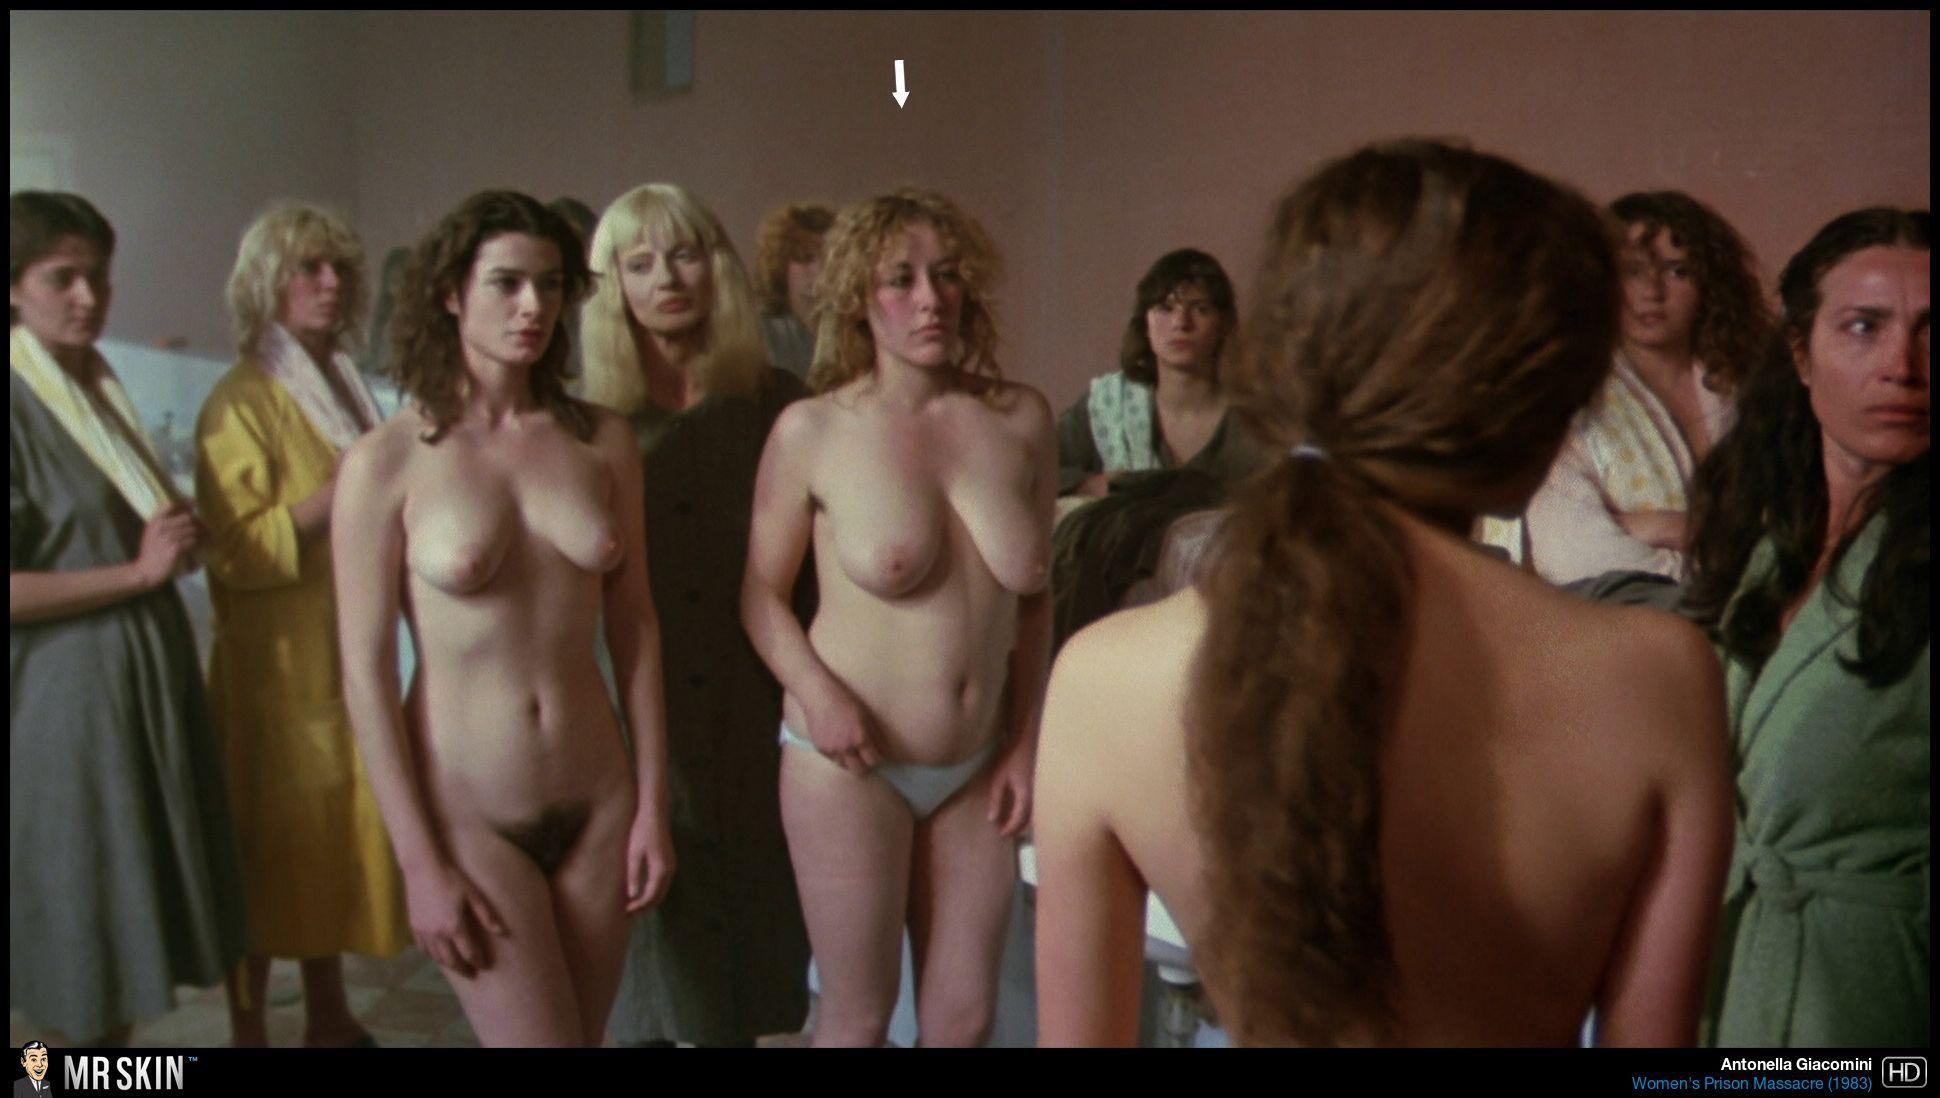 free-mature-women-movie-nude-scenes